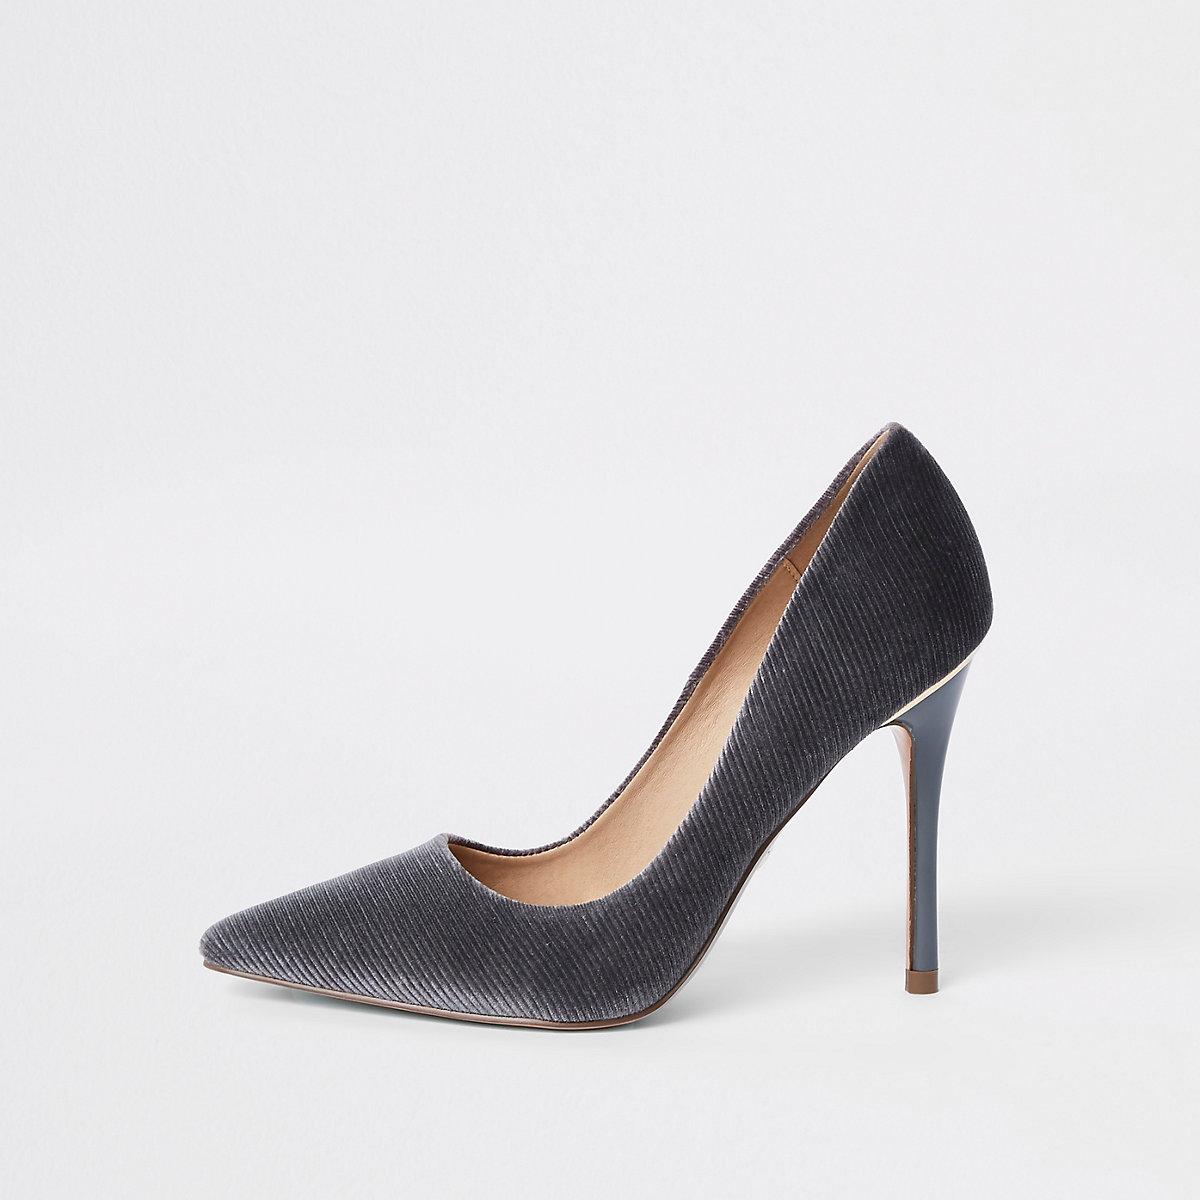 Light grey court shoes